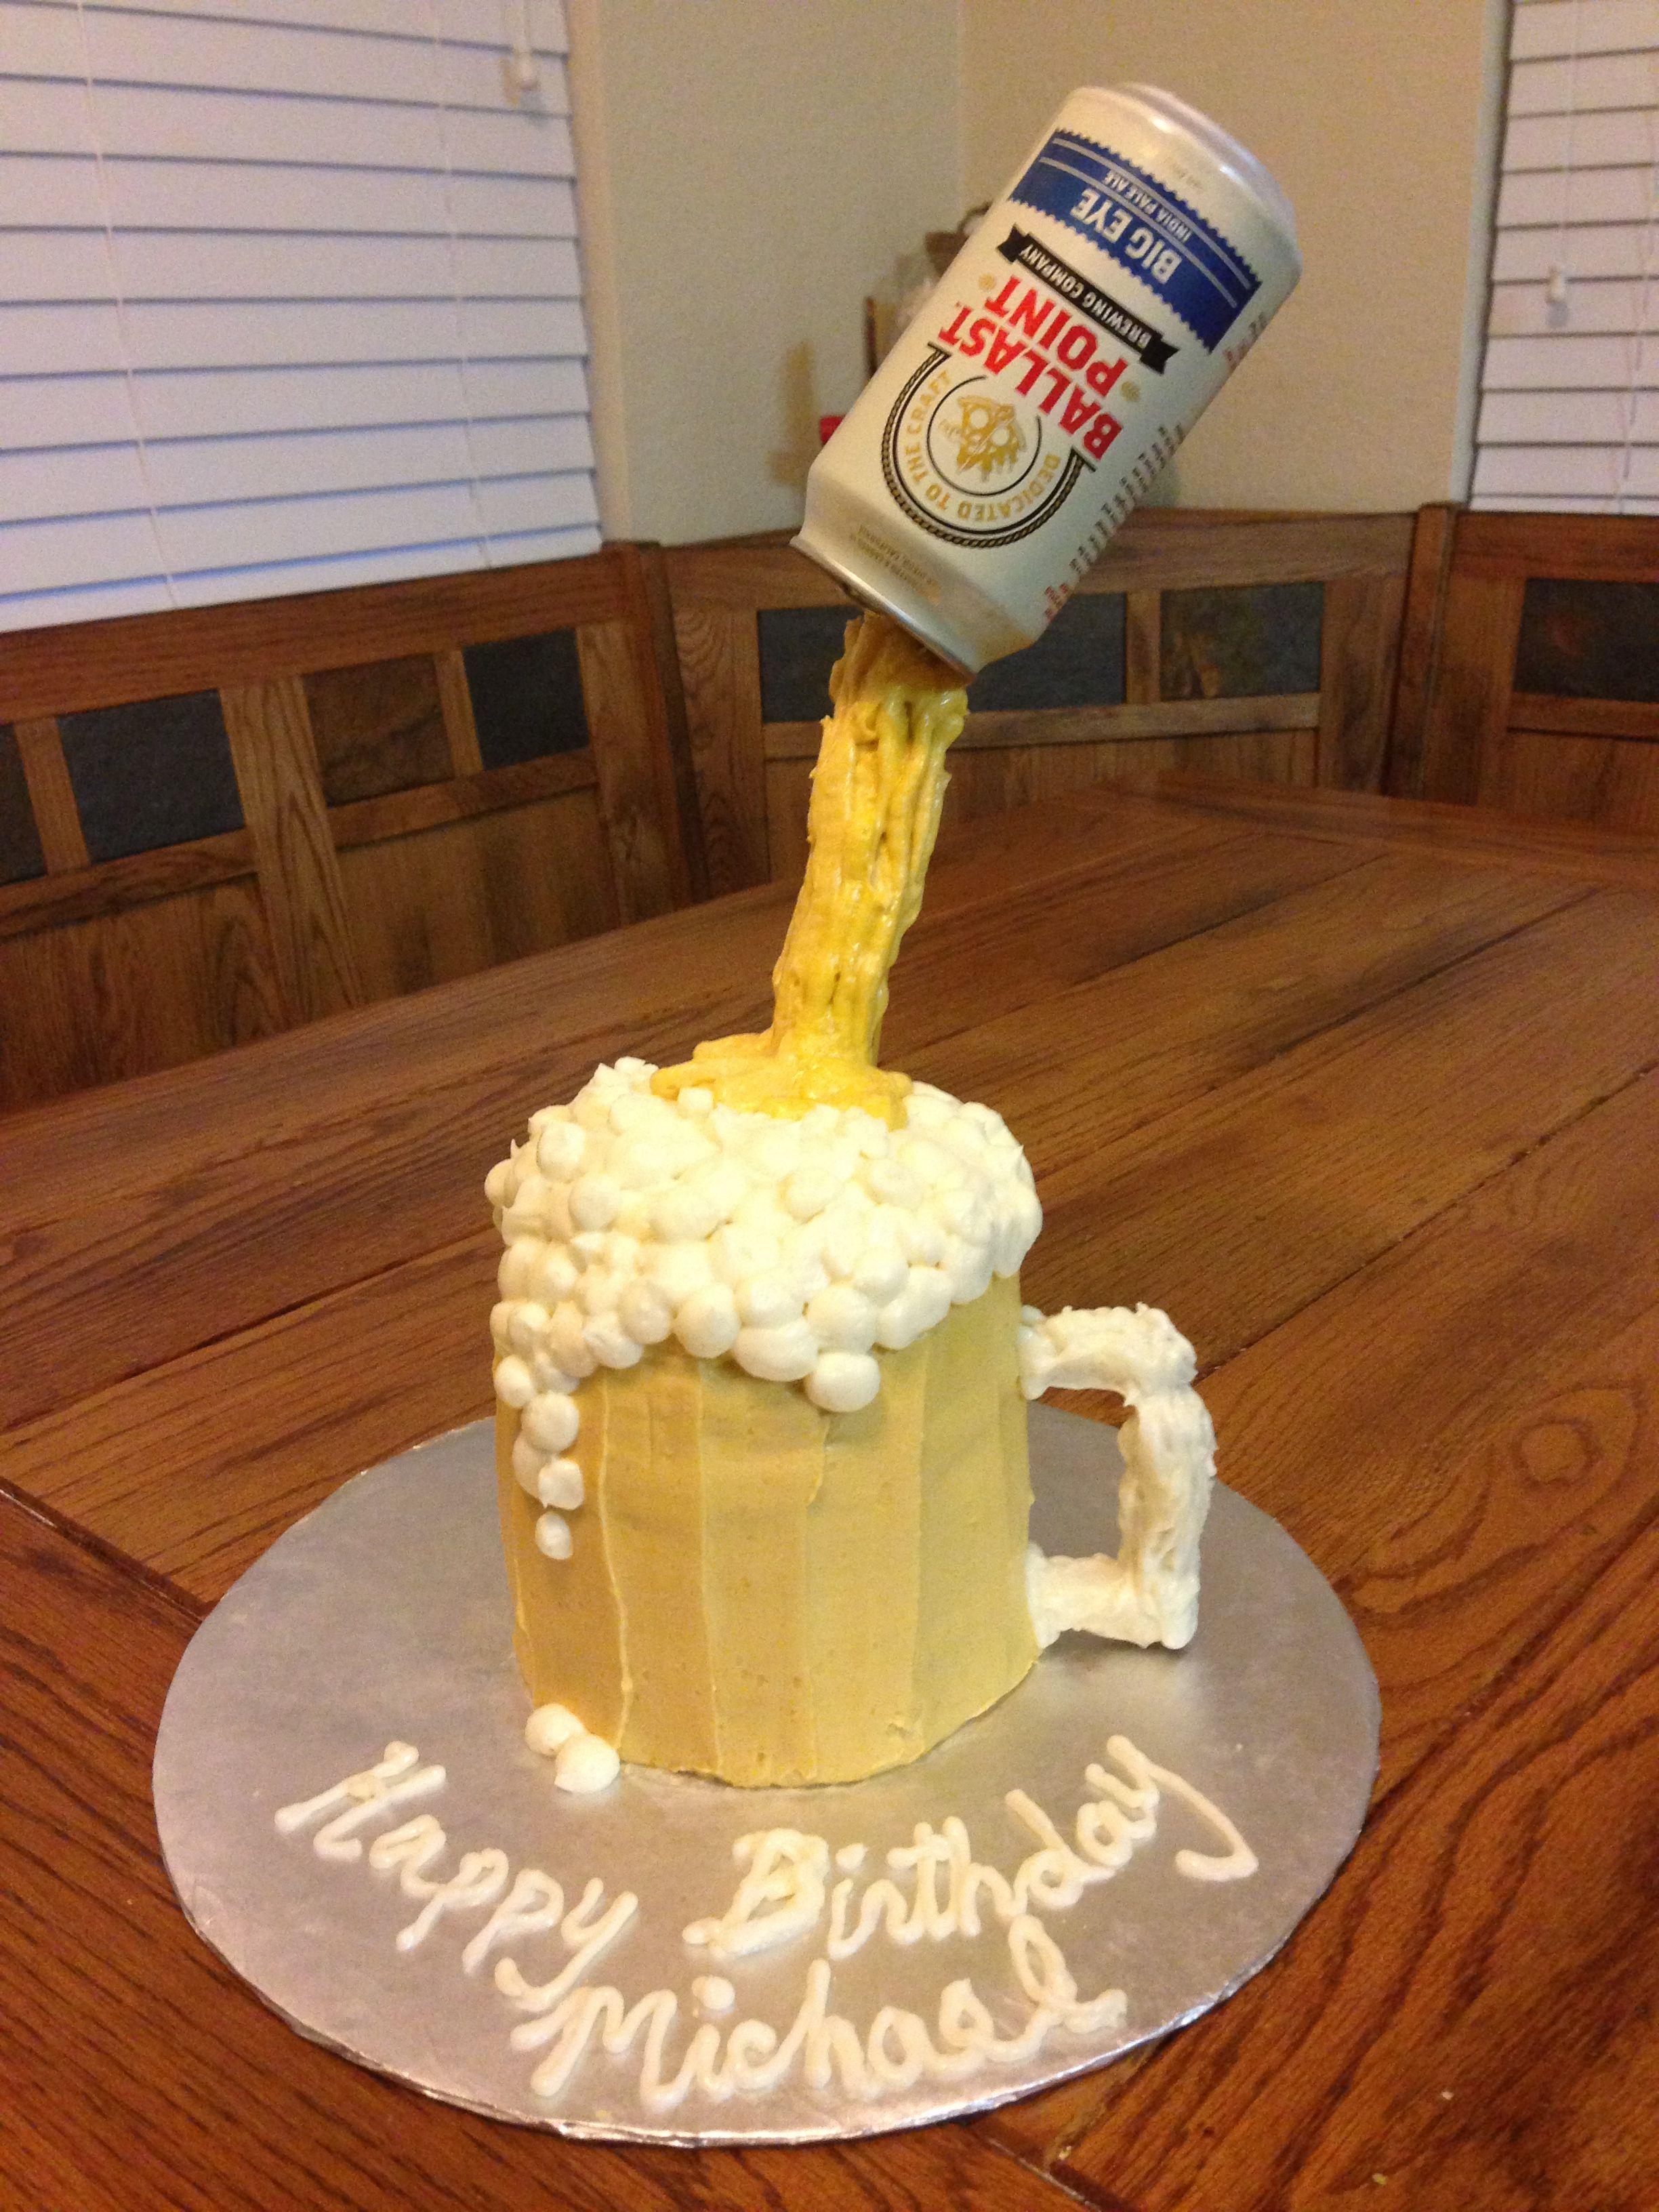 Beer cake by Luneta